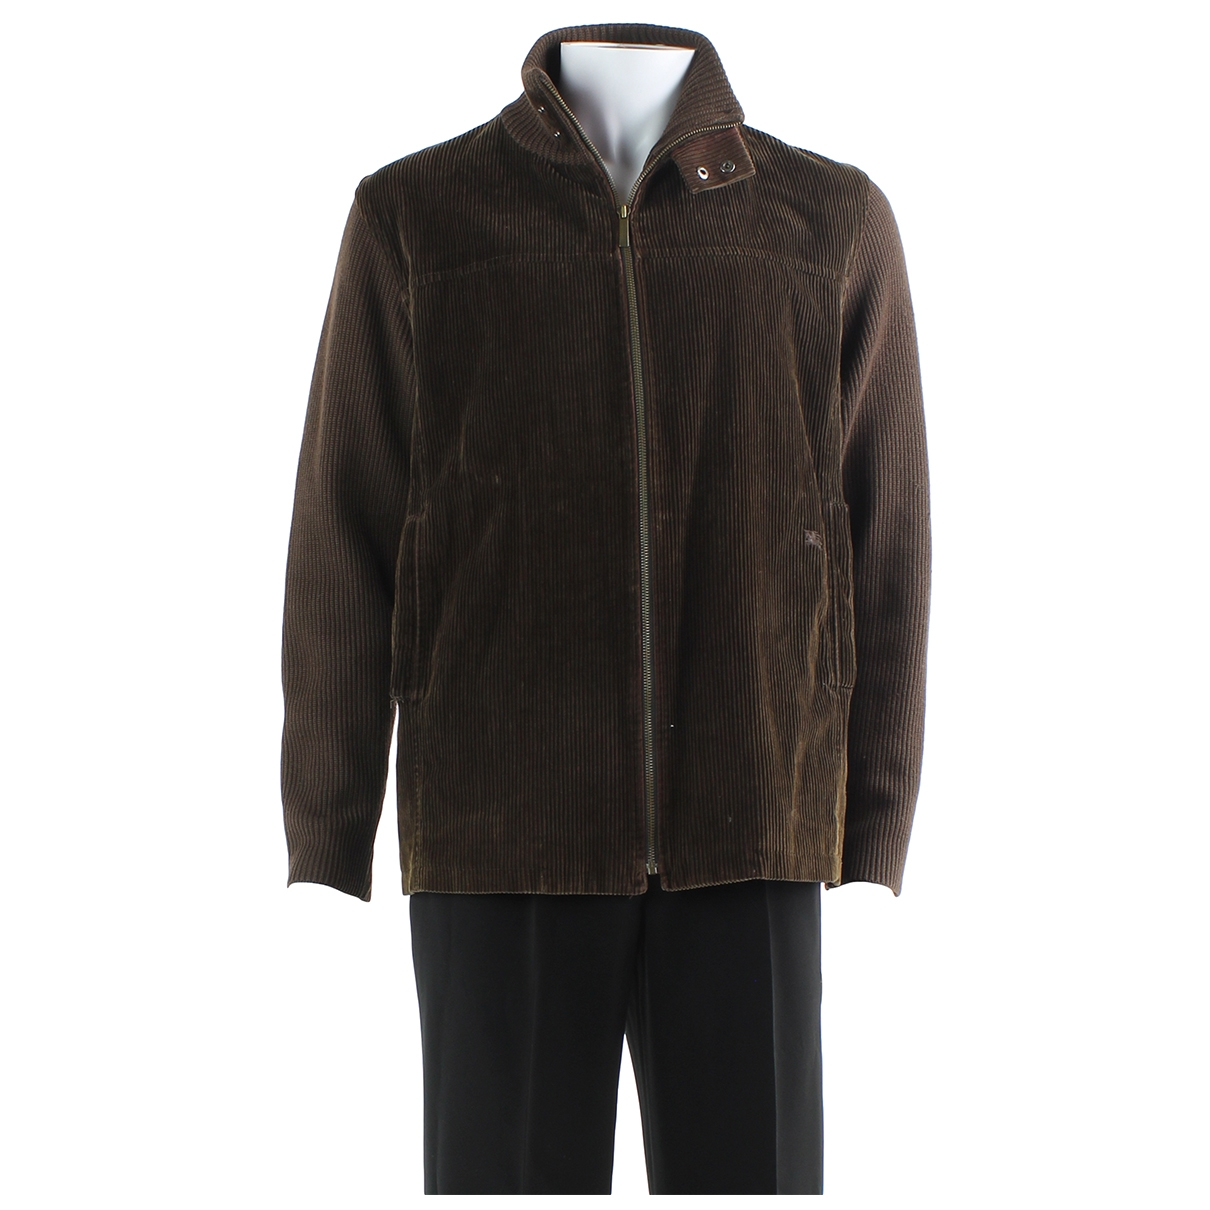 Burberry \N Jacke in  Braun Wolle